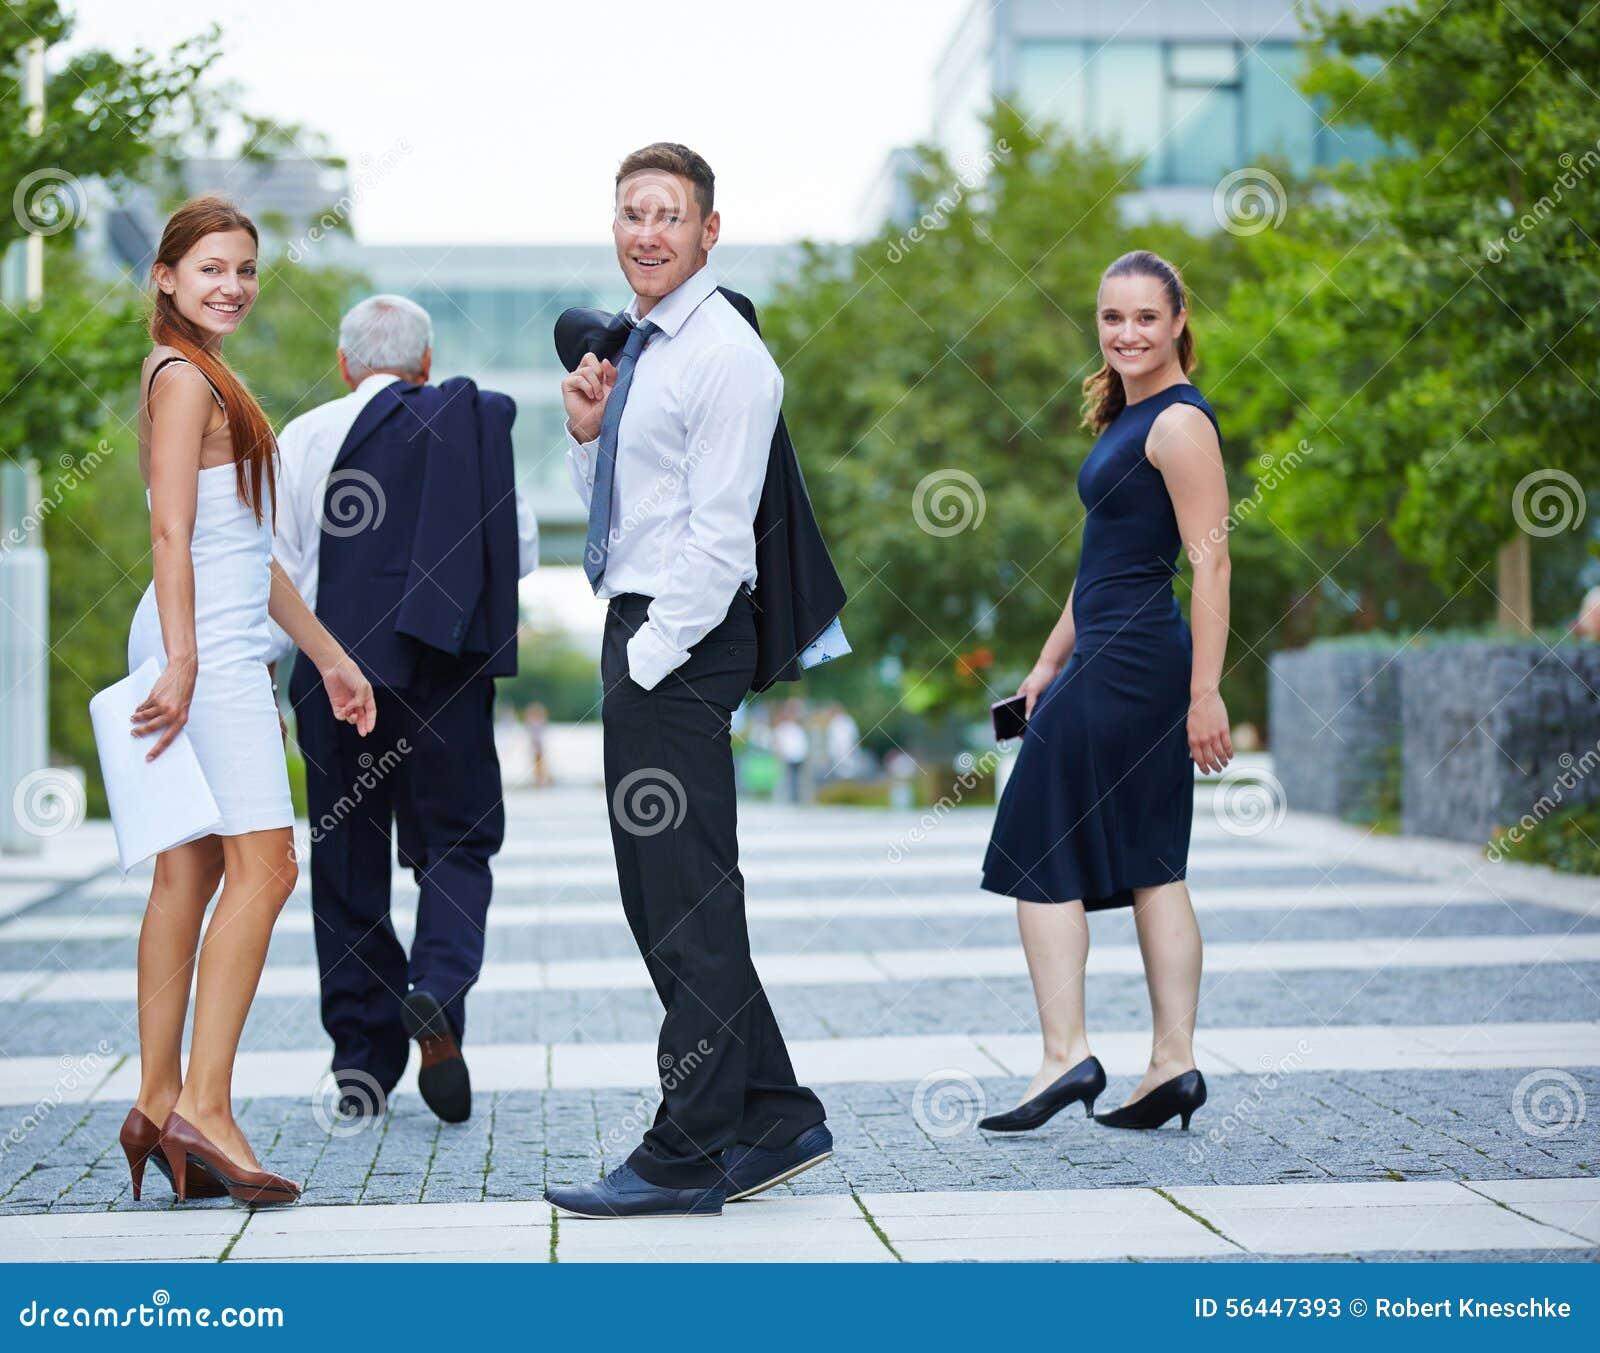 Business People Turning Around While Walking Stock Image